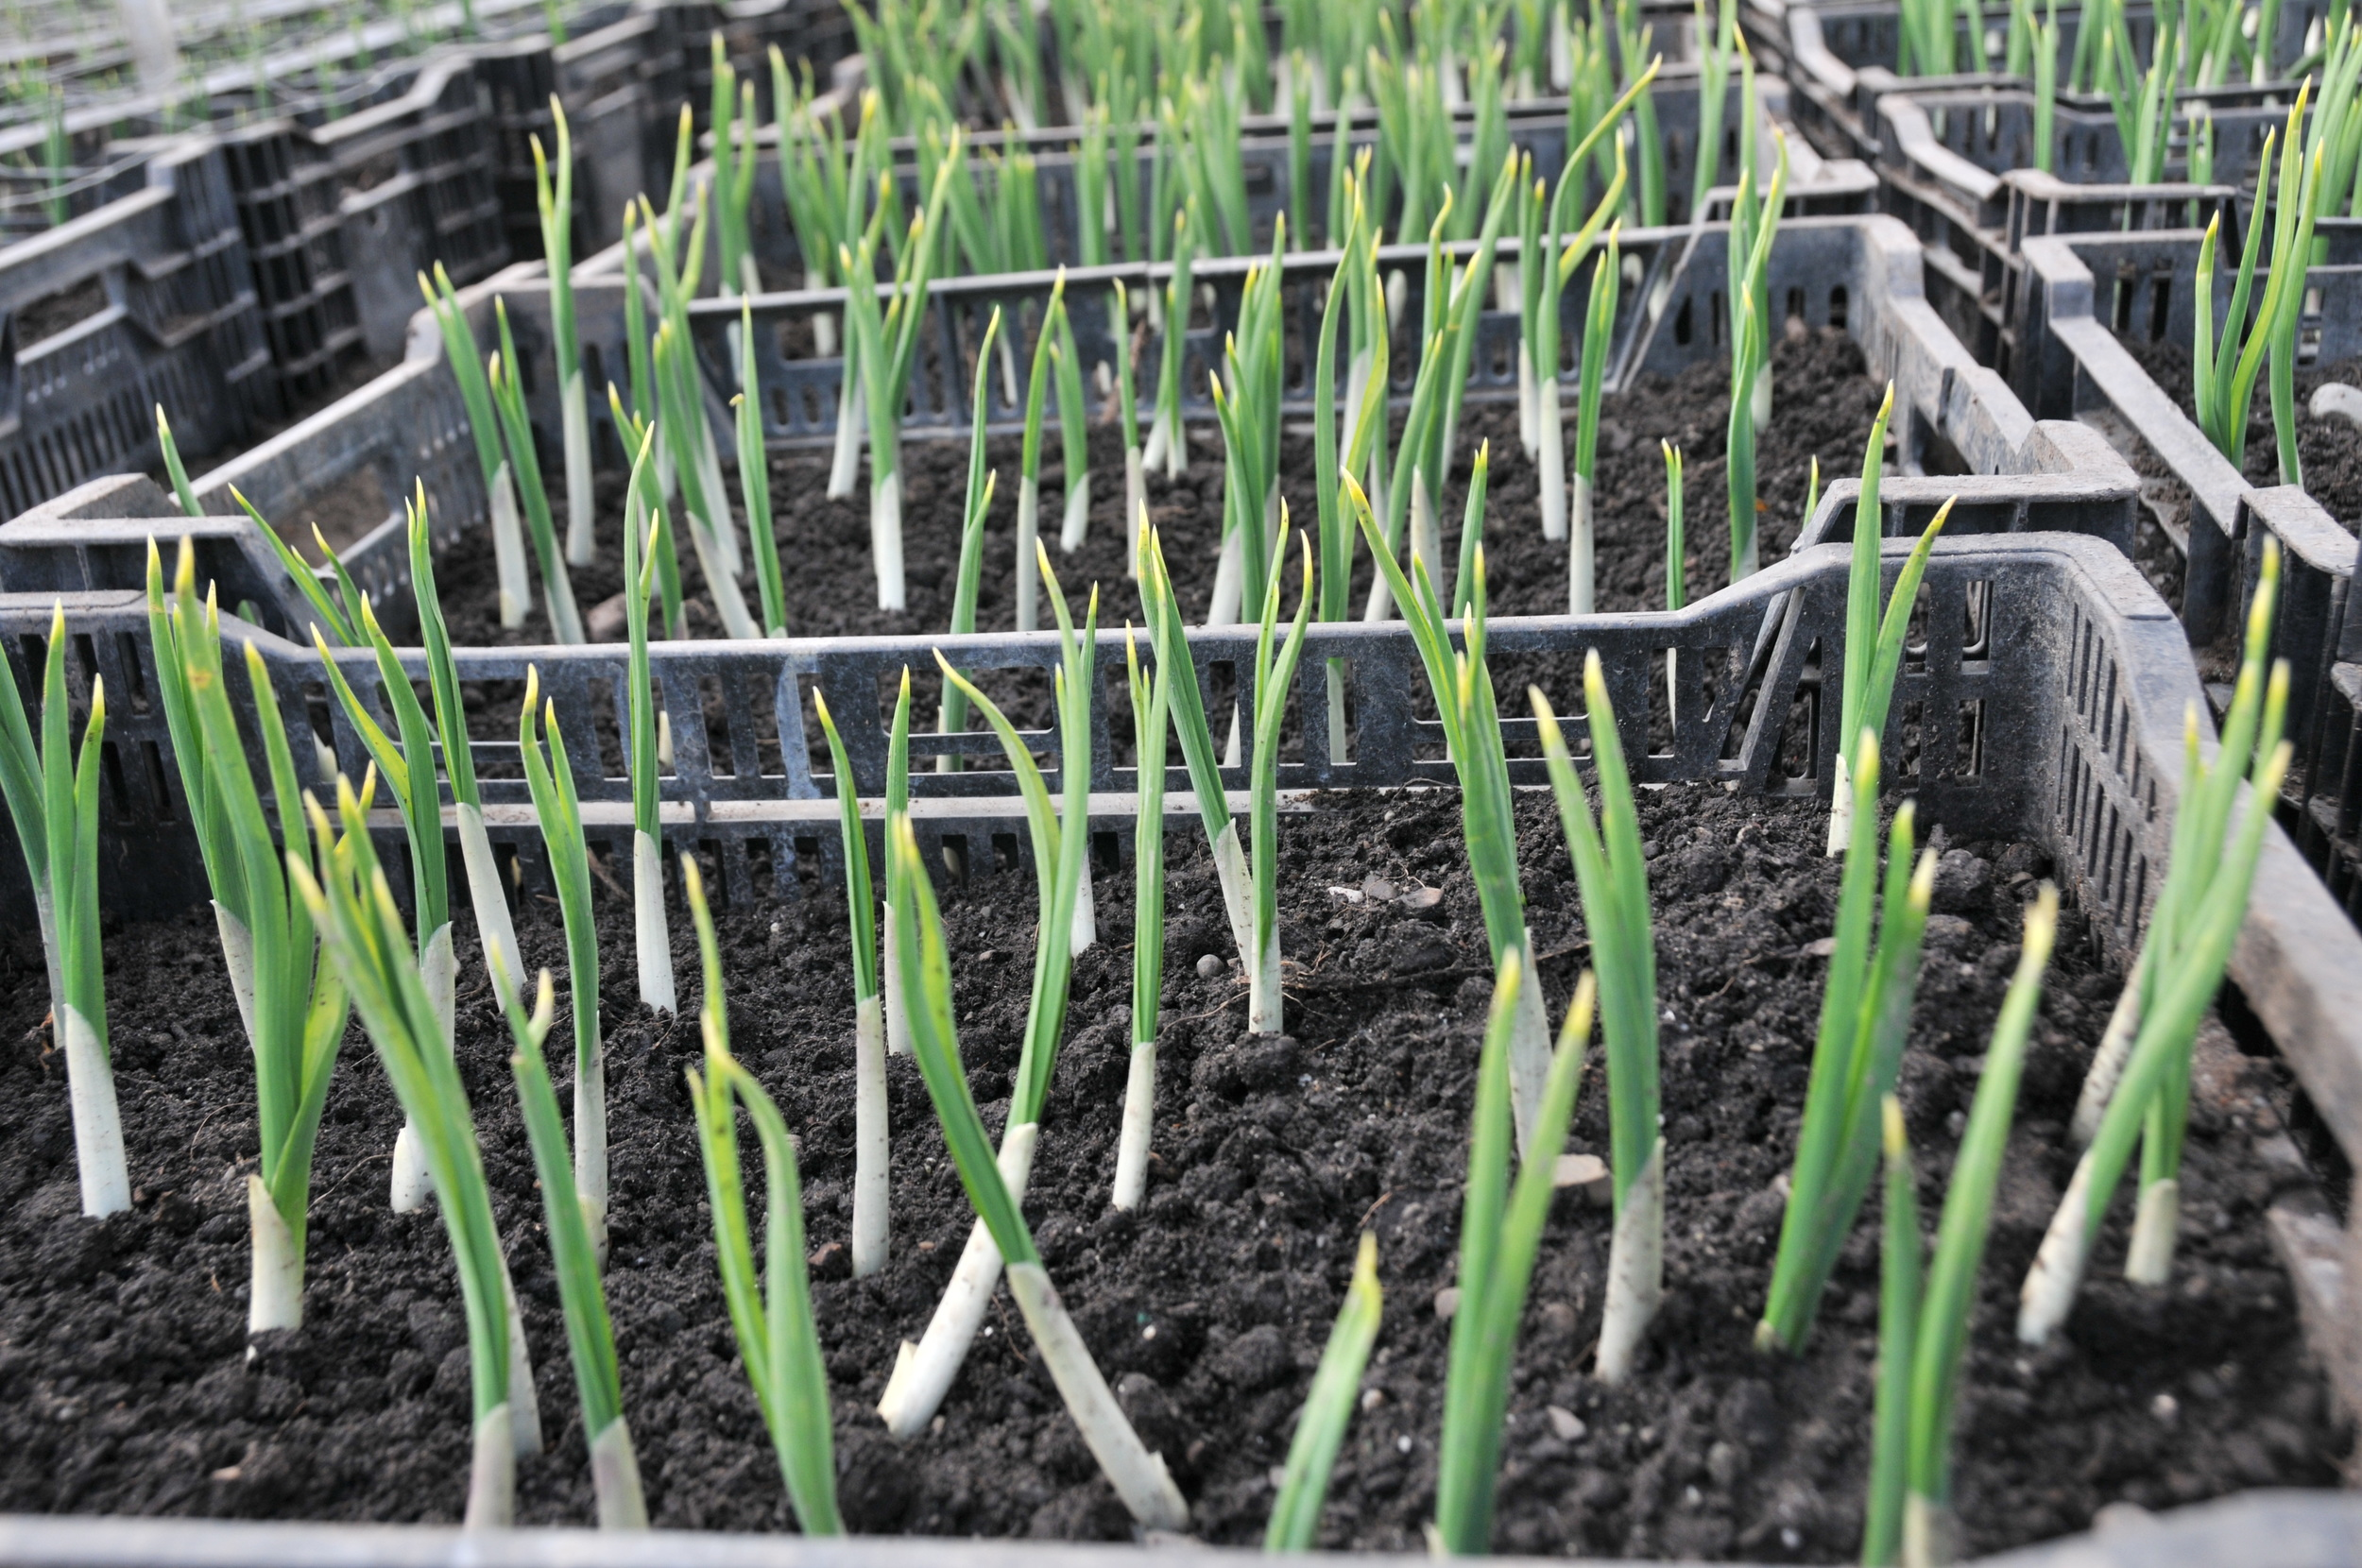 Iris sprouts